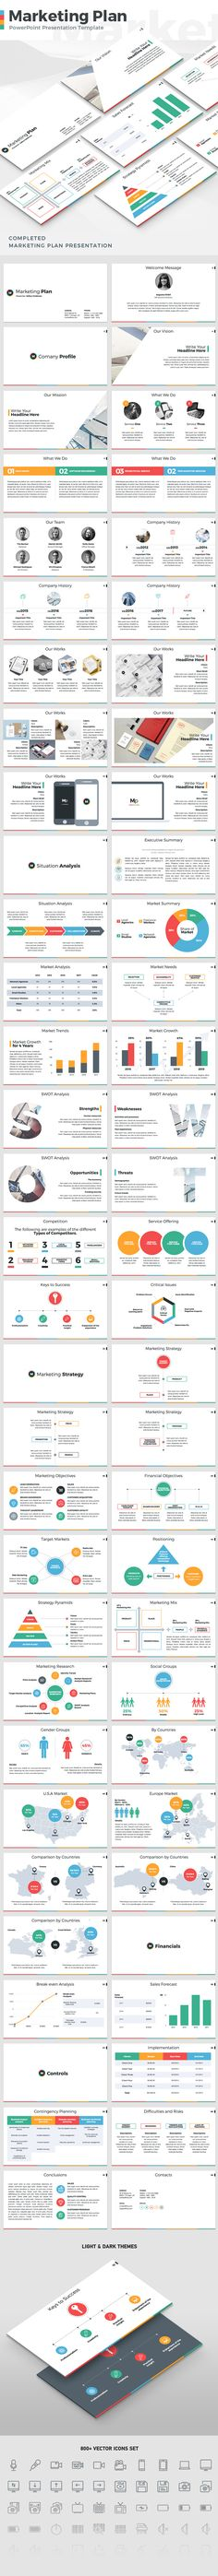 Marketing Plan - PowerPoint Presentation Template (PowerPoint Templates)